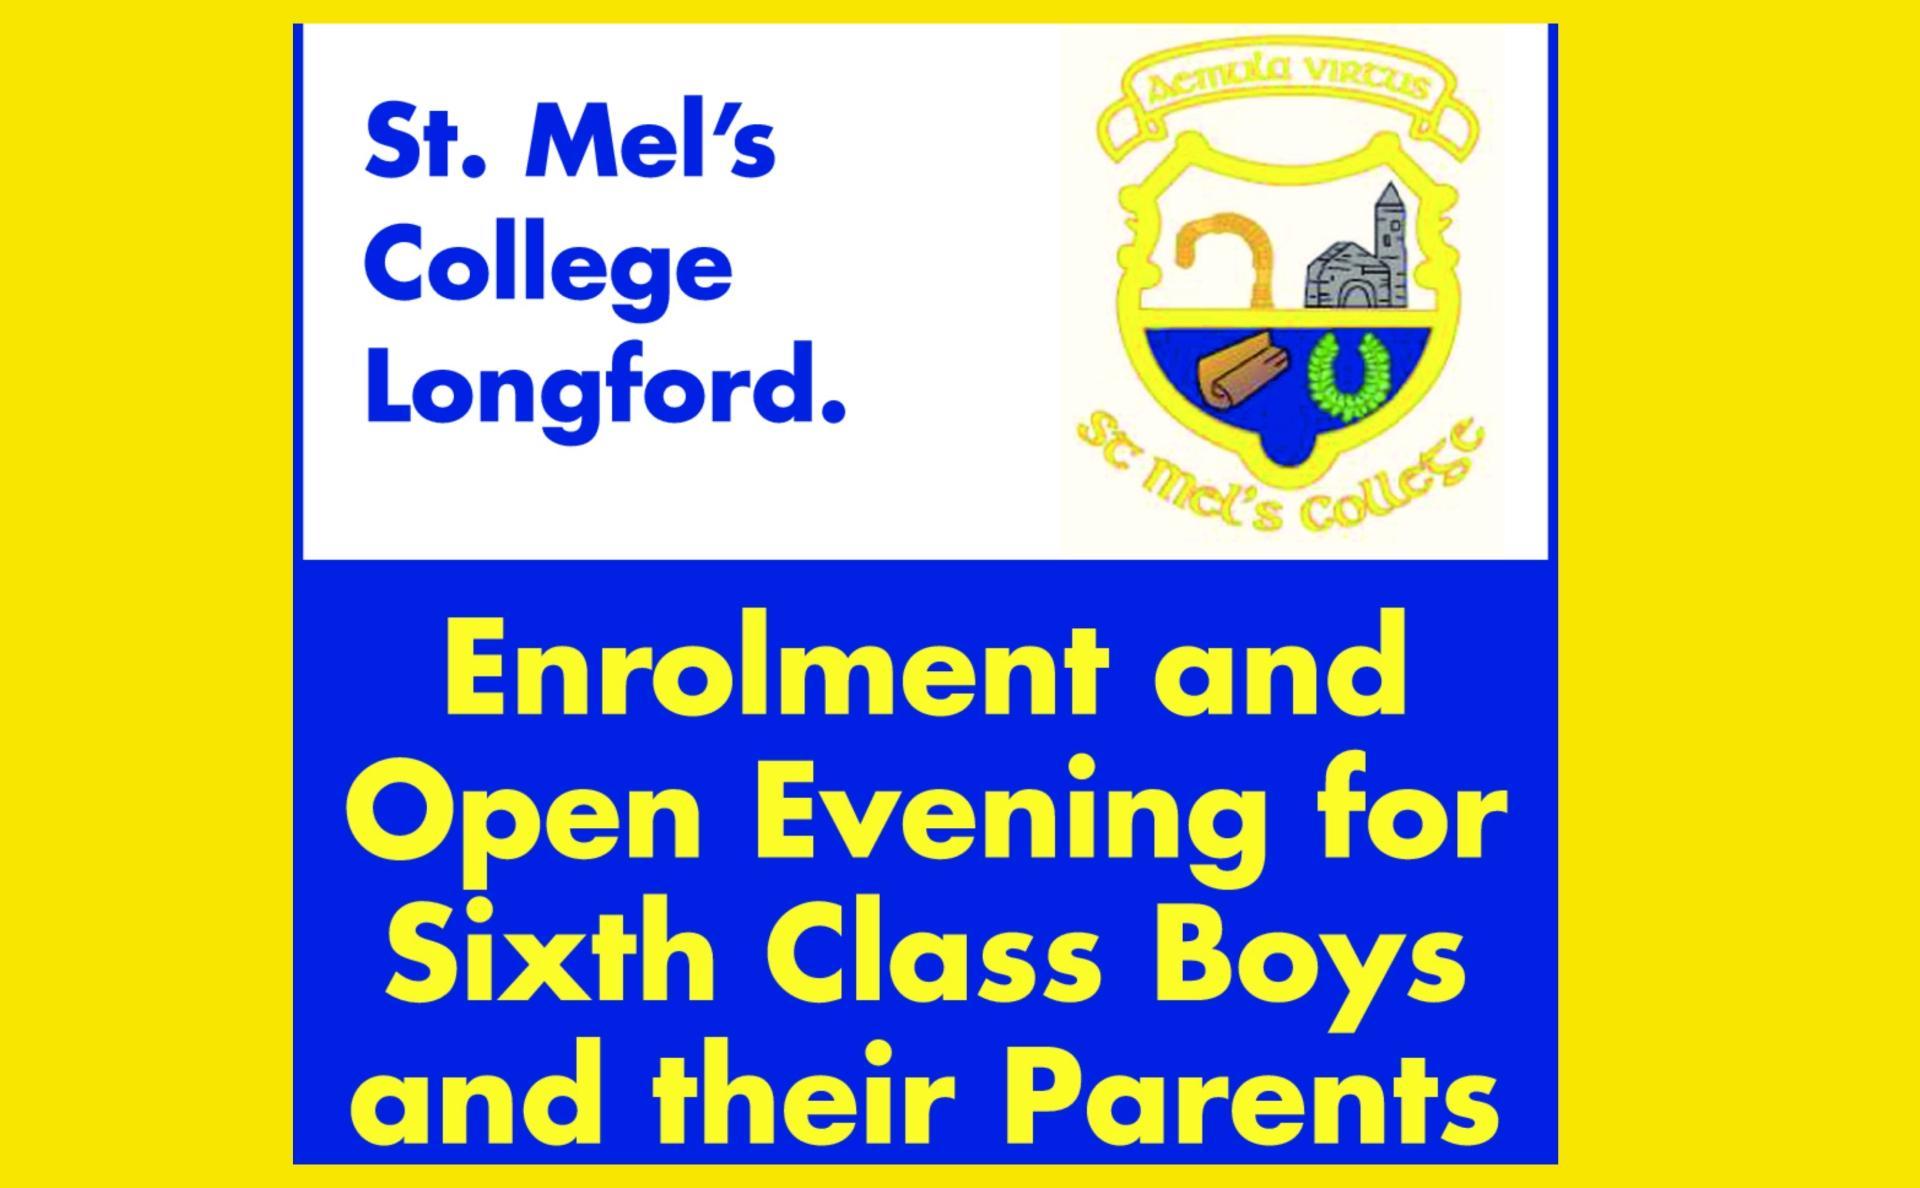 St Mel/s College Longford